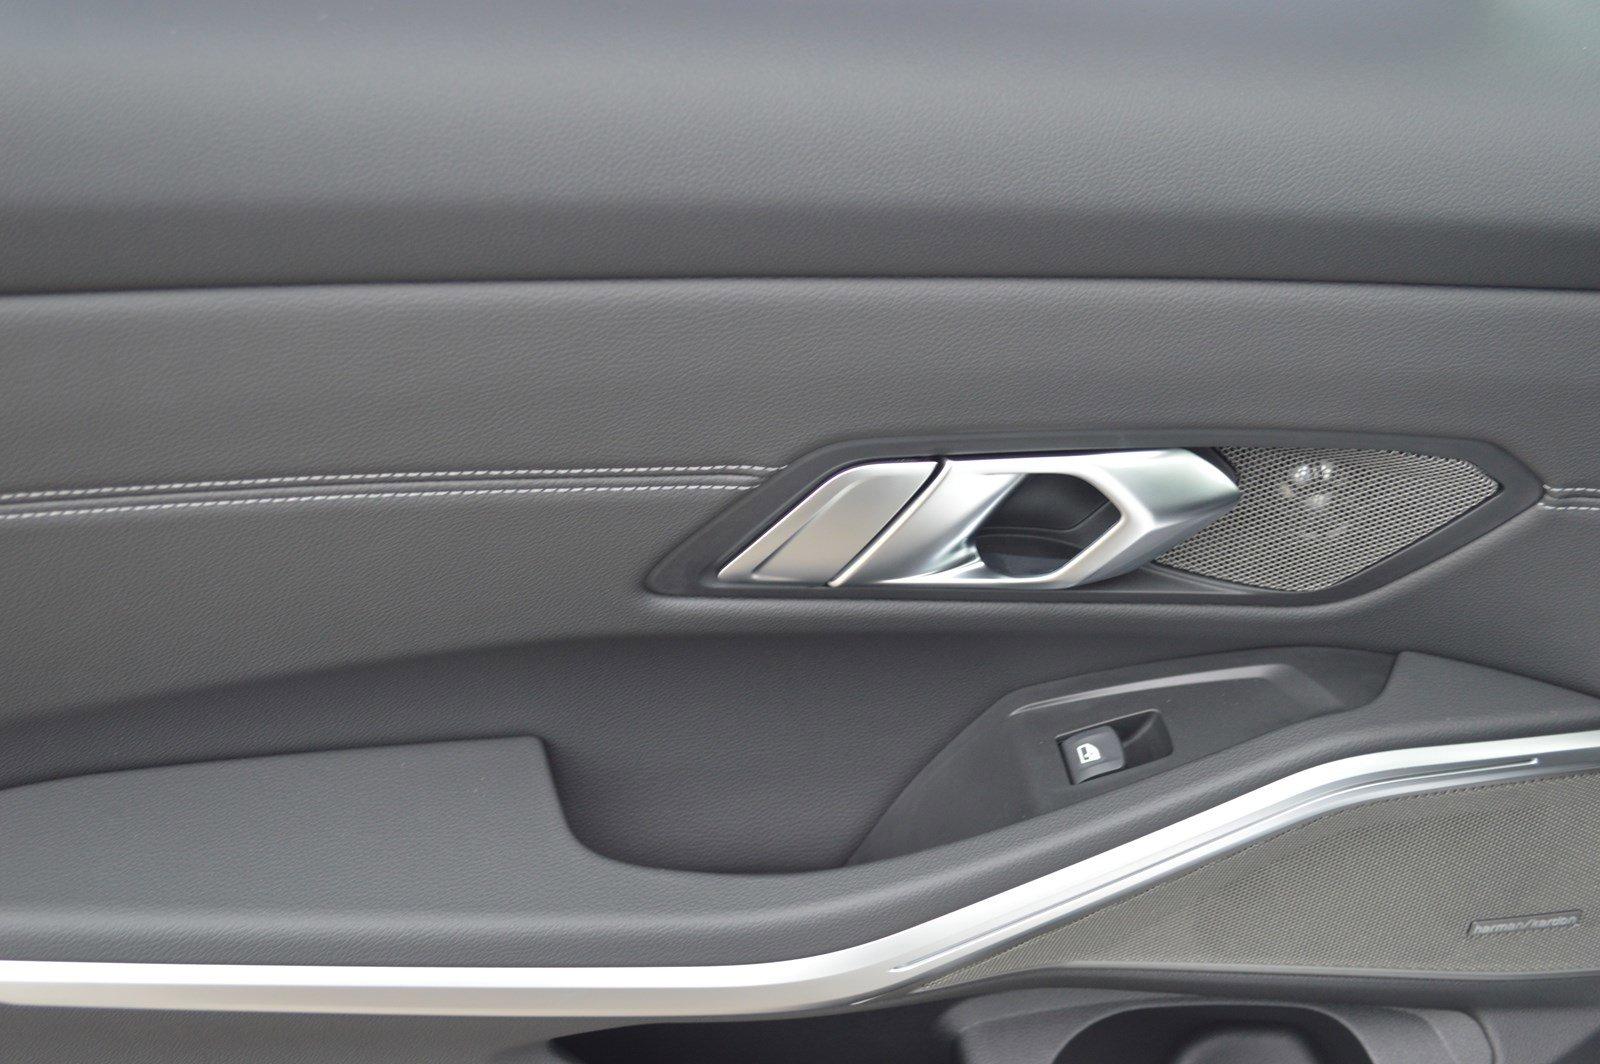 Pre-Owned 2020 BMW 3 Series M340i xDrive